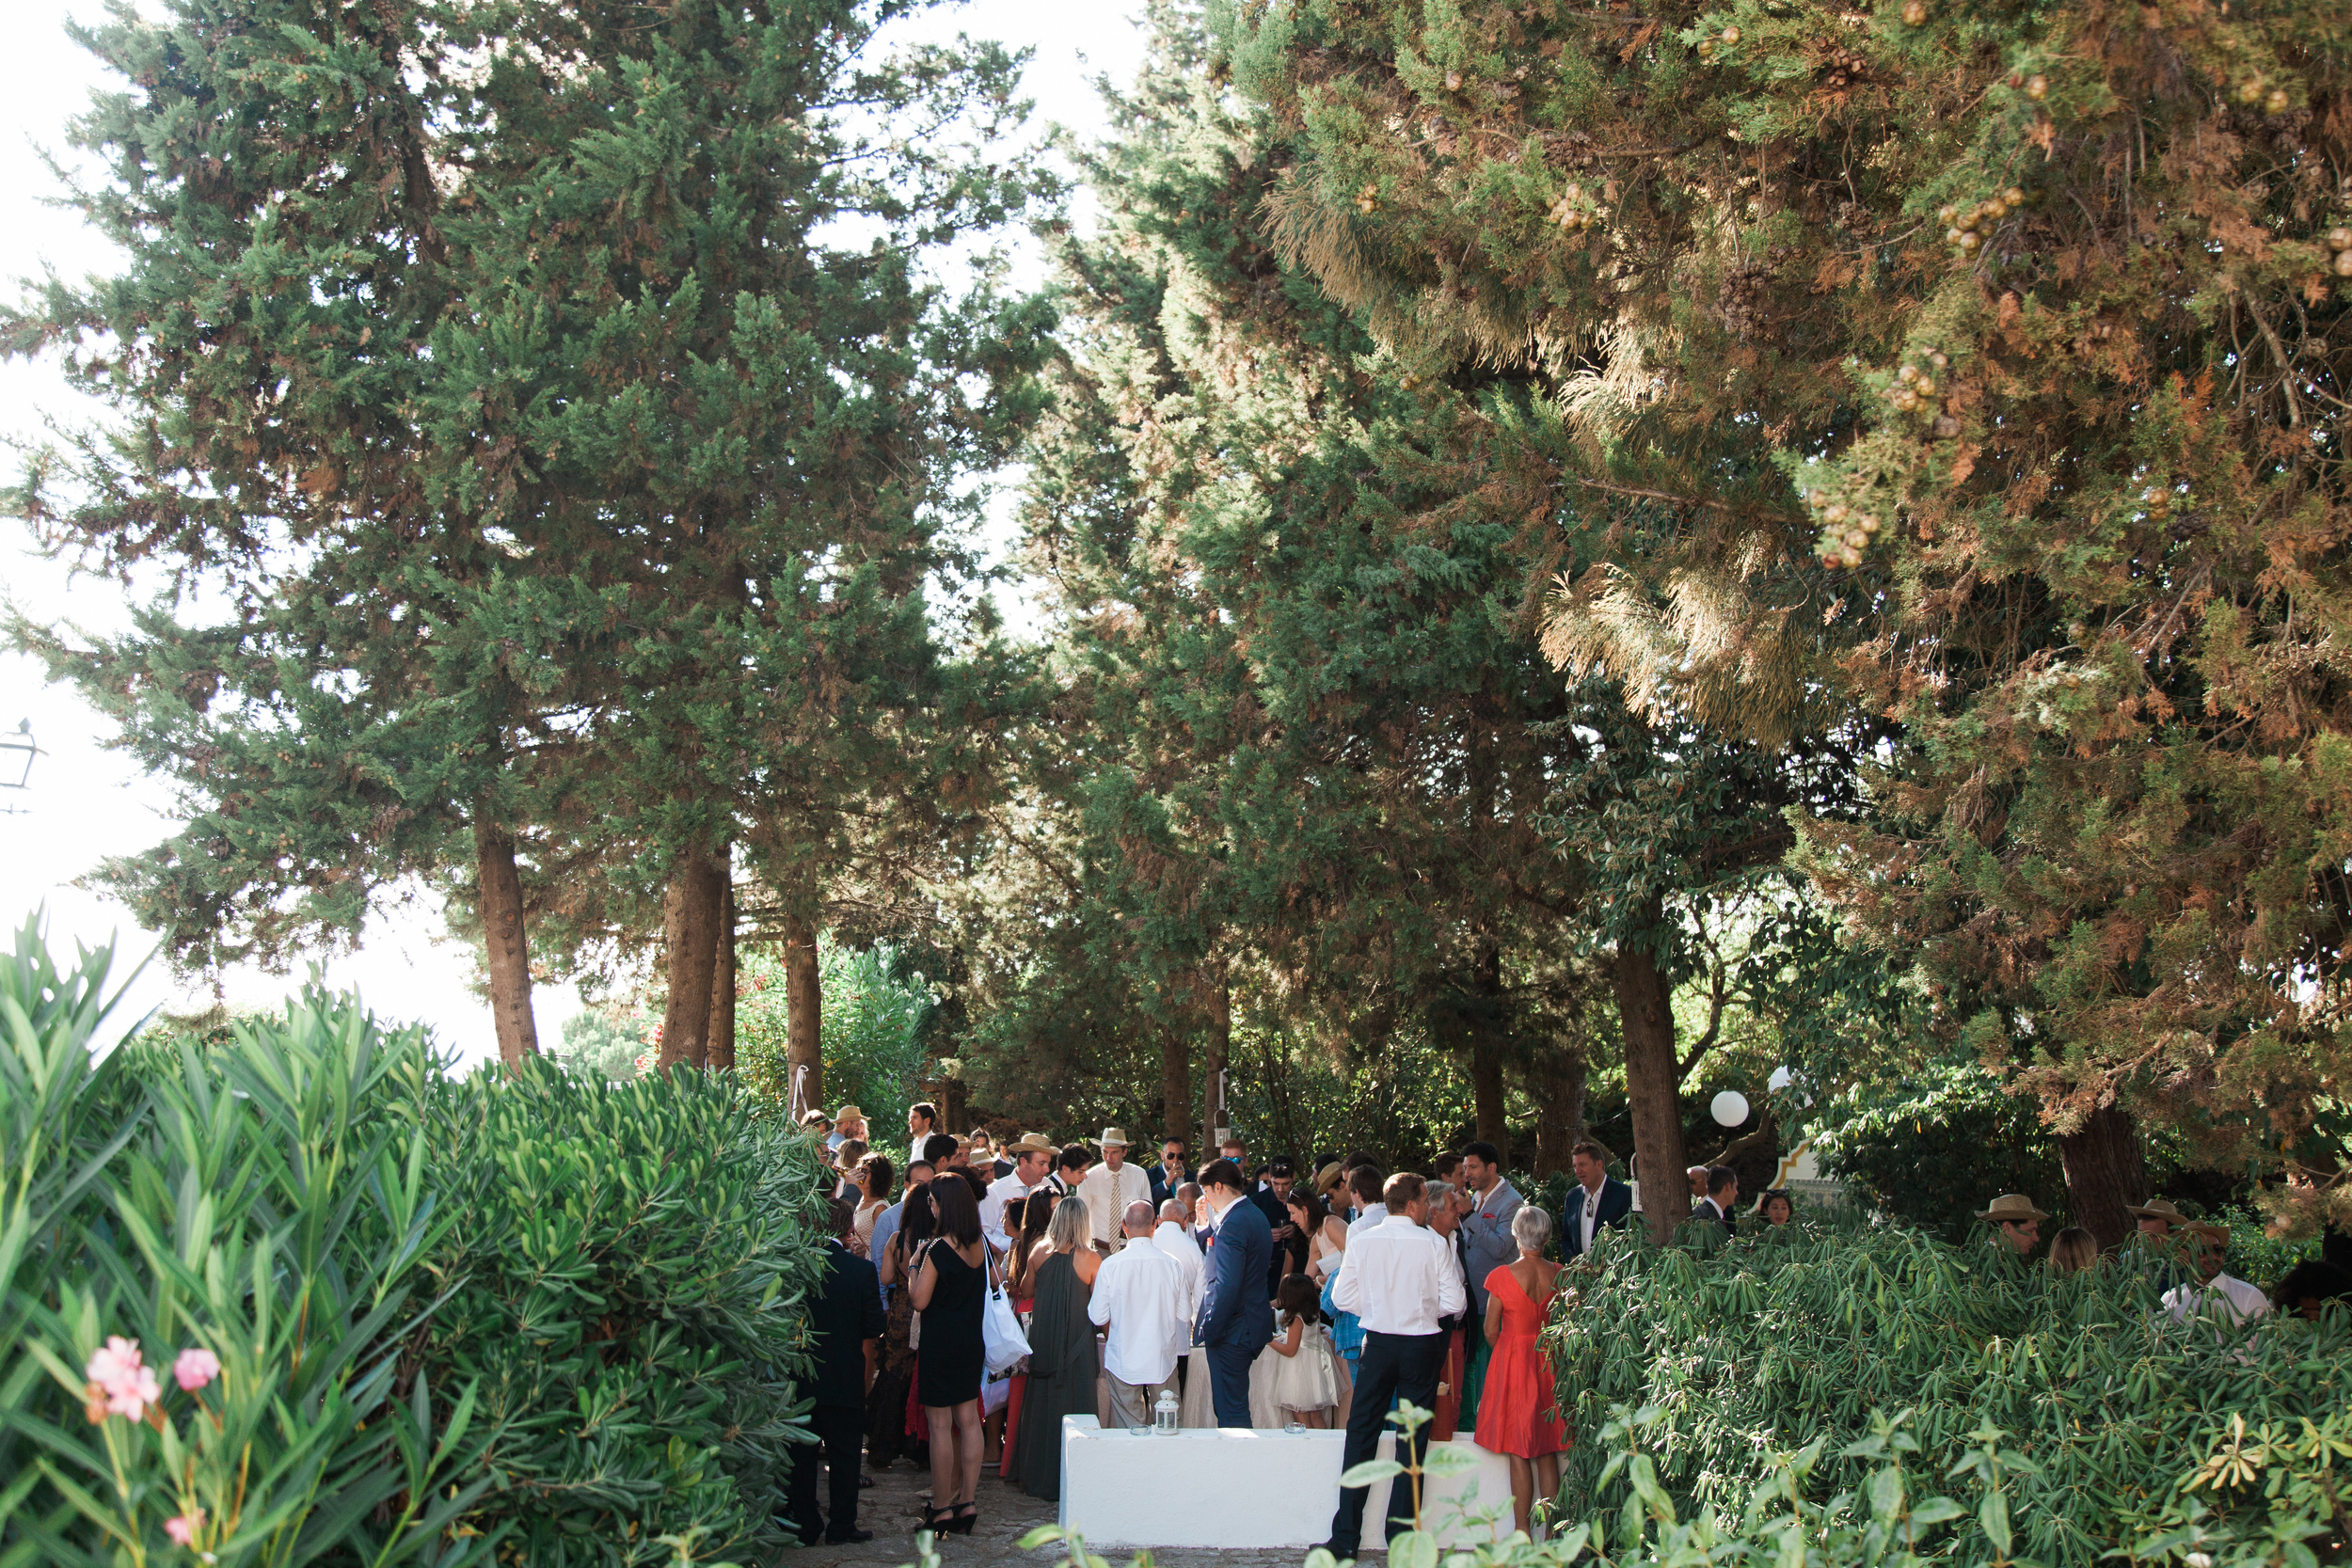 mariarao+wedding+quinta+del+carmen-478.jpg